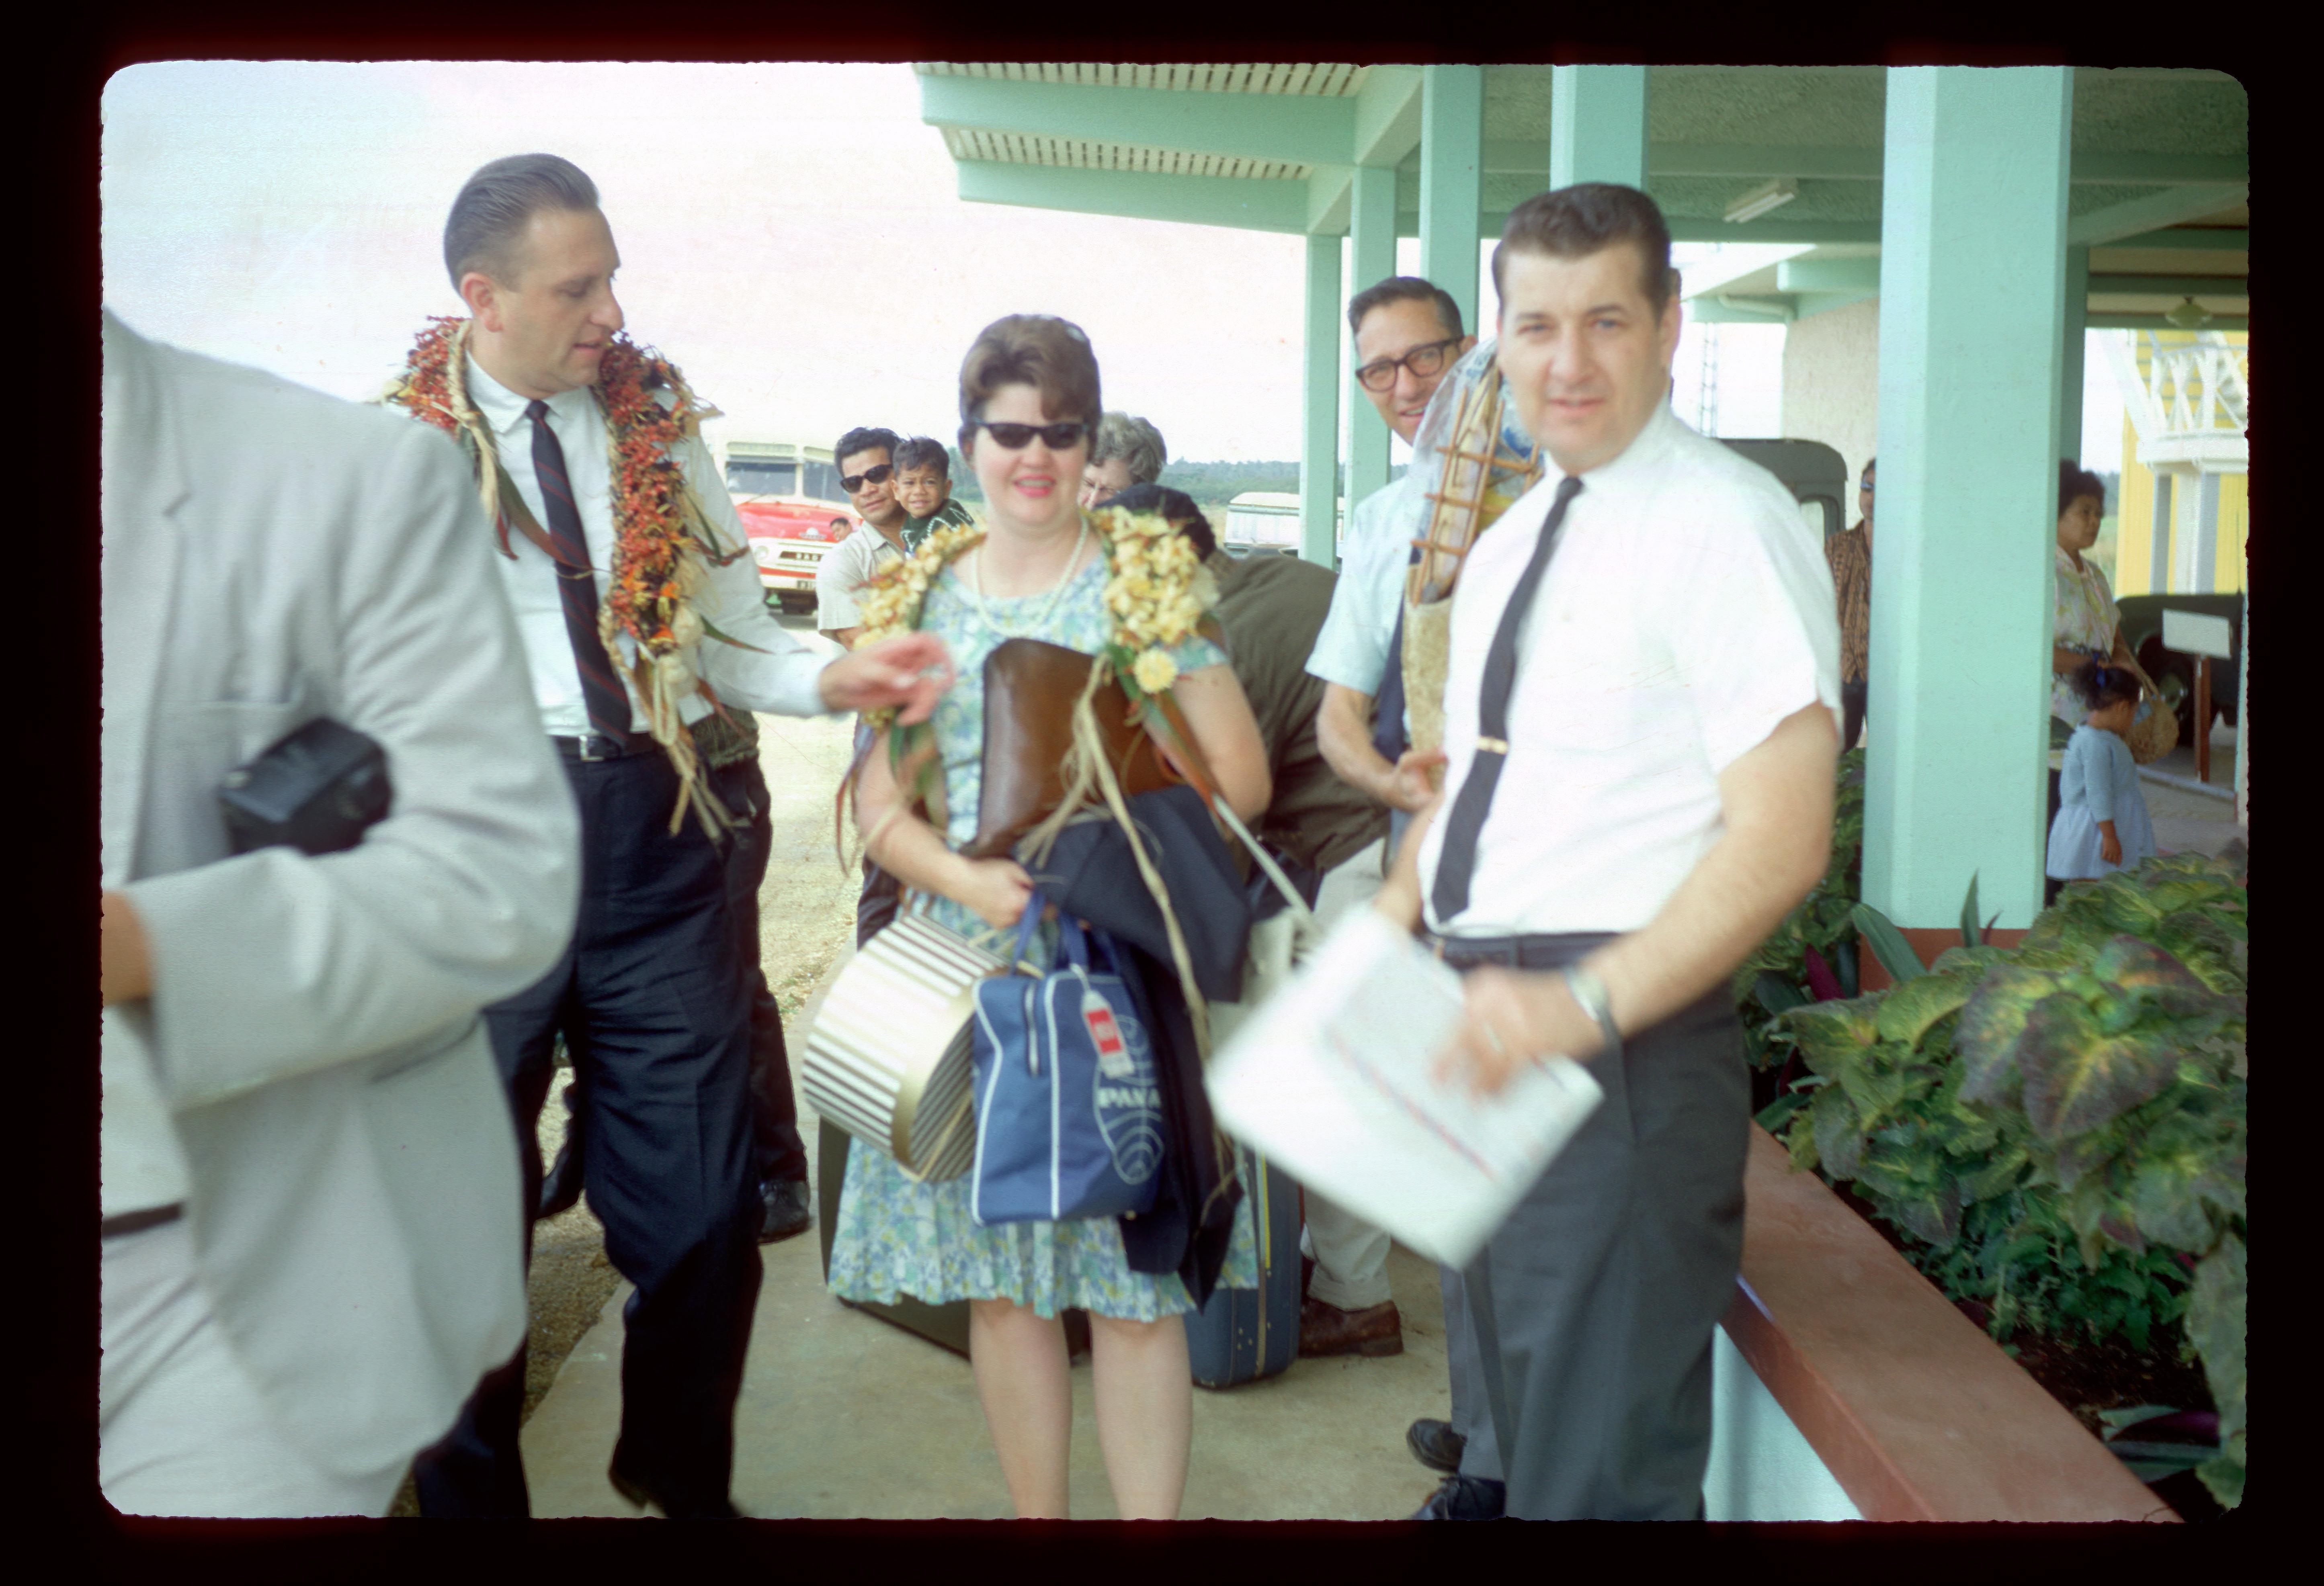 Elder Thomas S. Monson, left, joins Tonga Mission President John Groberg, right, at the airport in Tonga during a stake visit in September 1968.